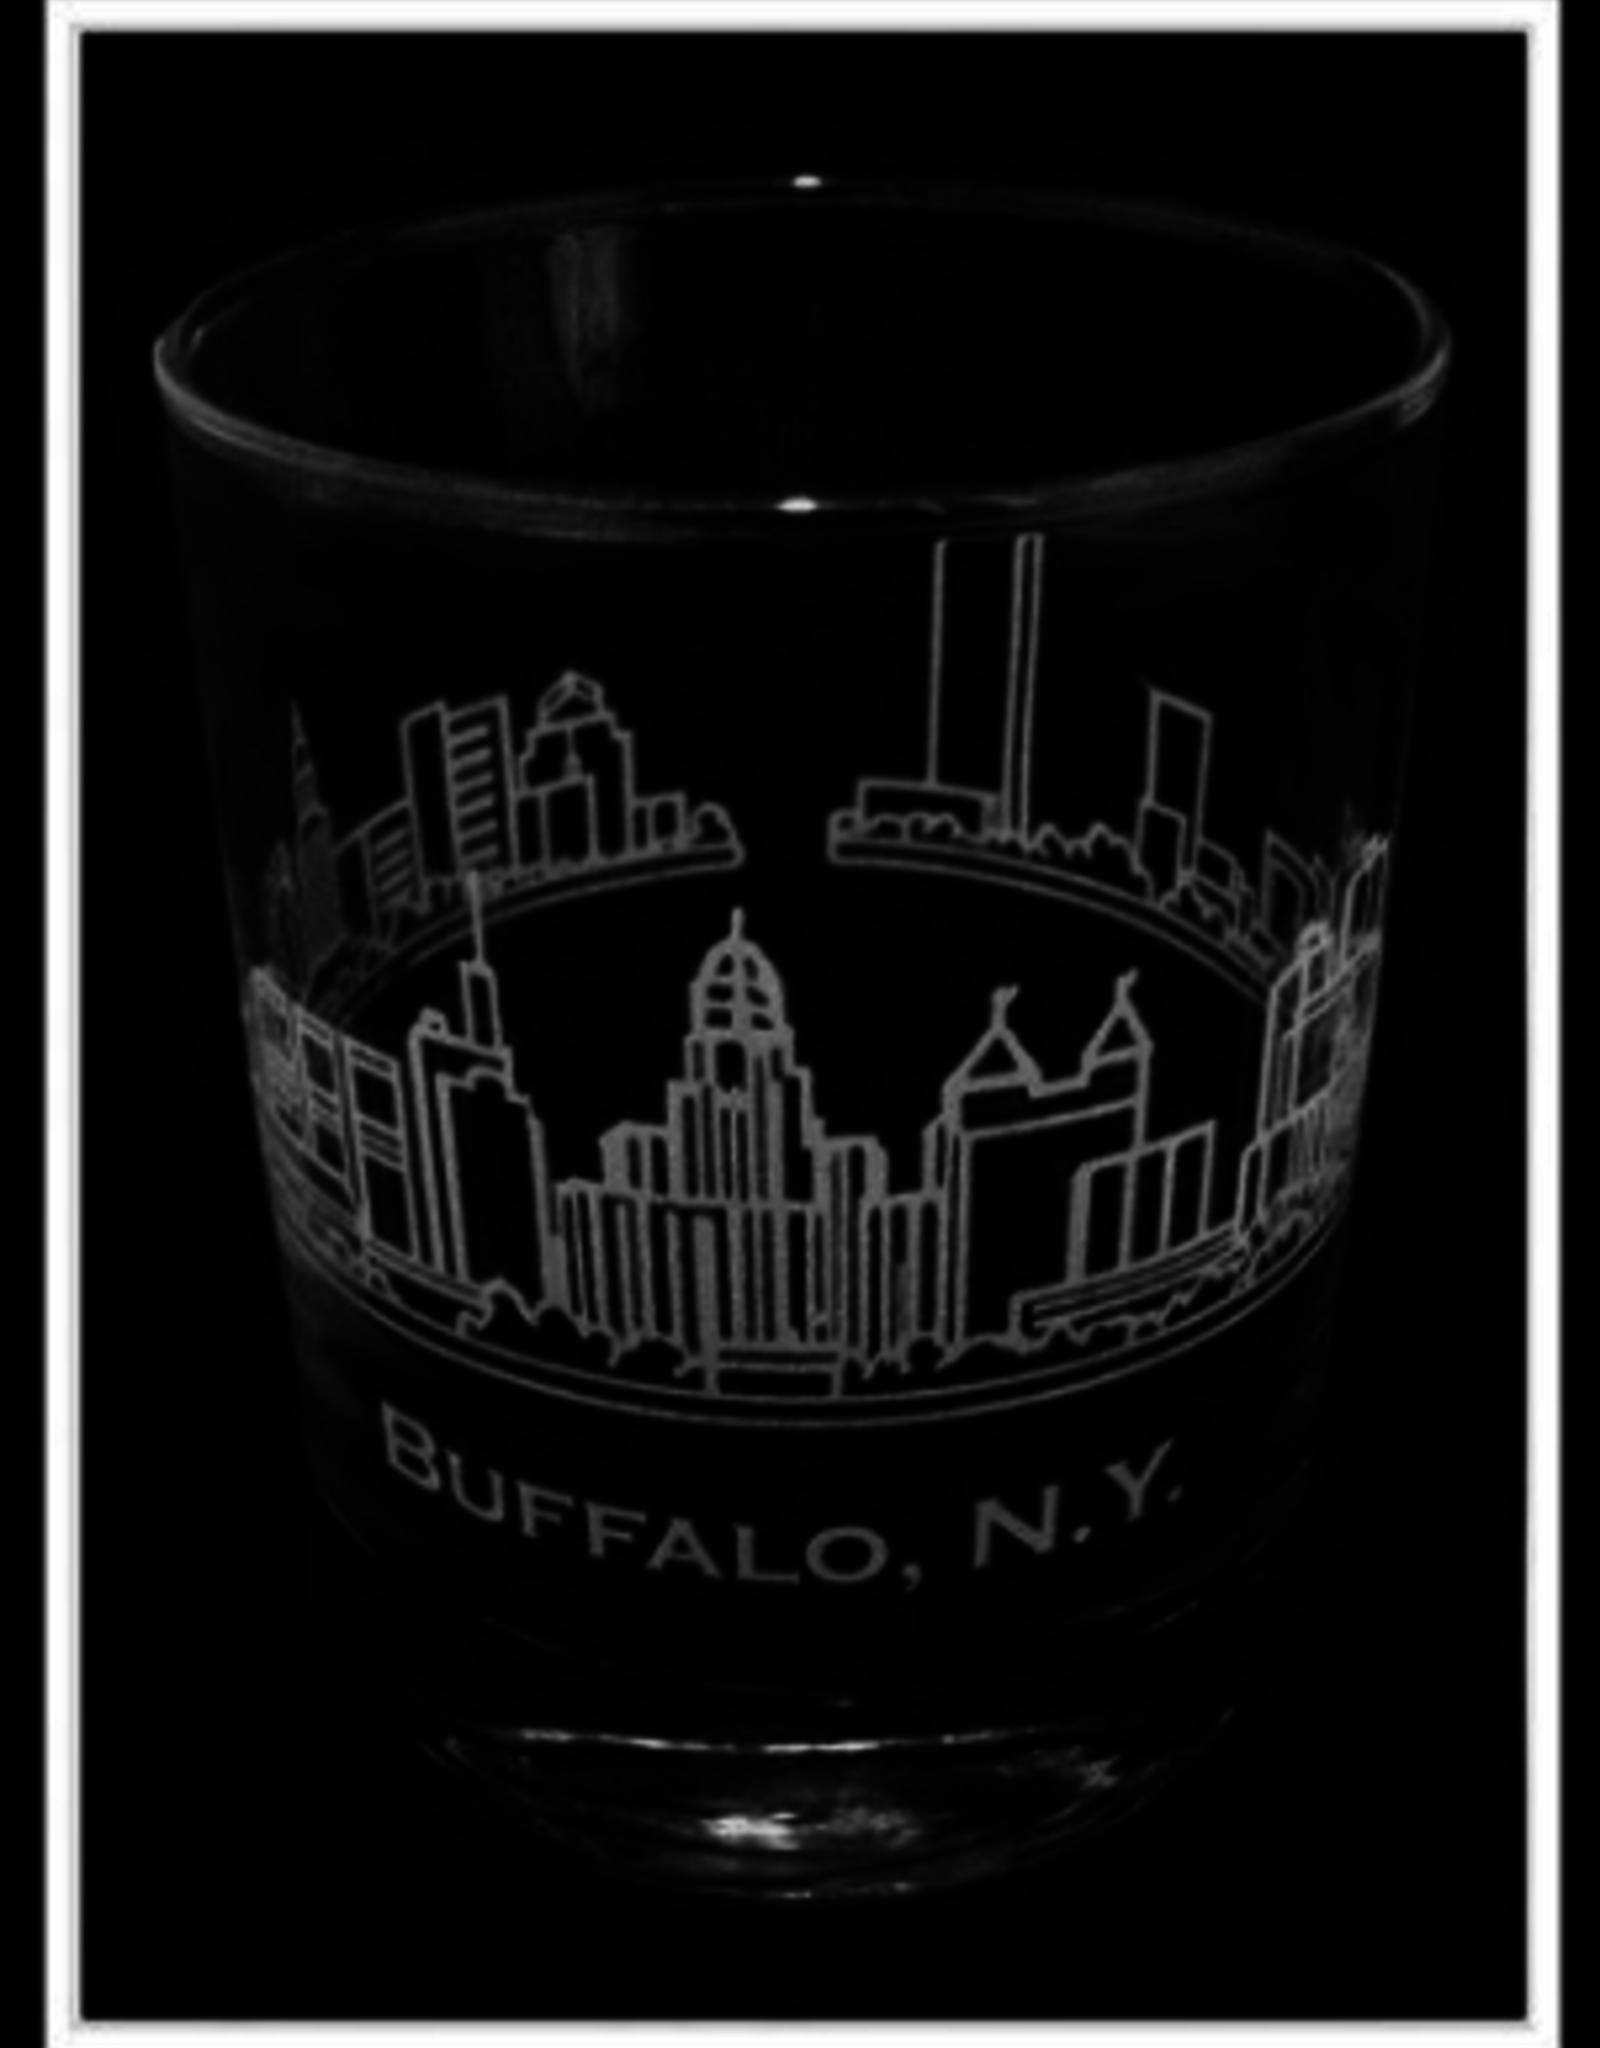 PREDMORE CREATIONS BUFFALO SKYLINE ROCK GLASS